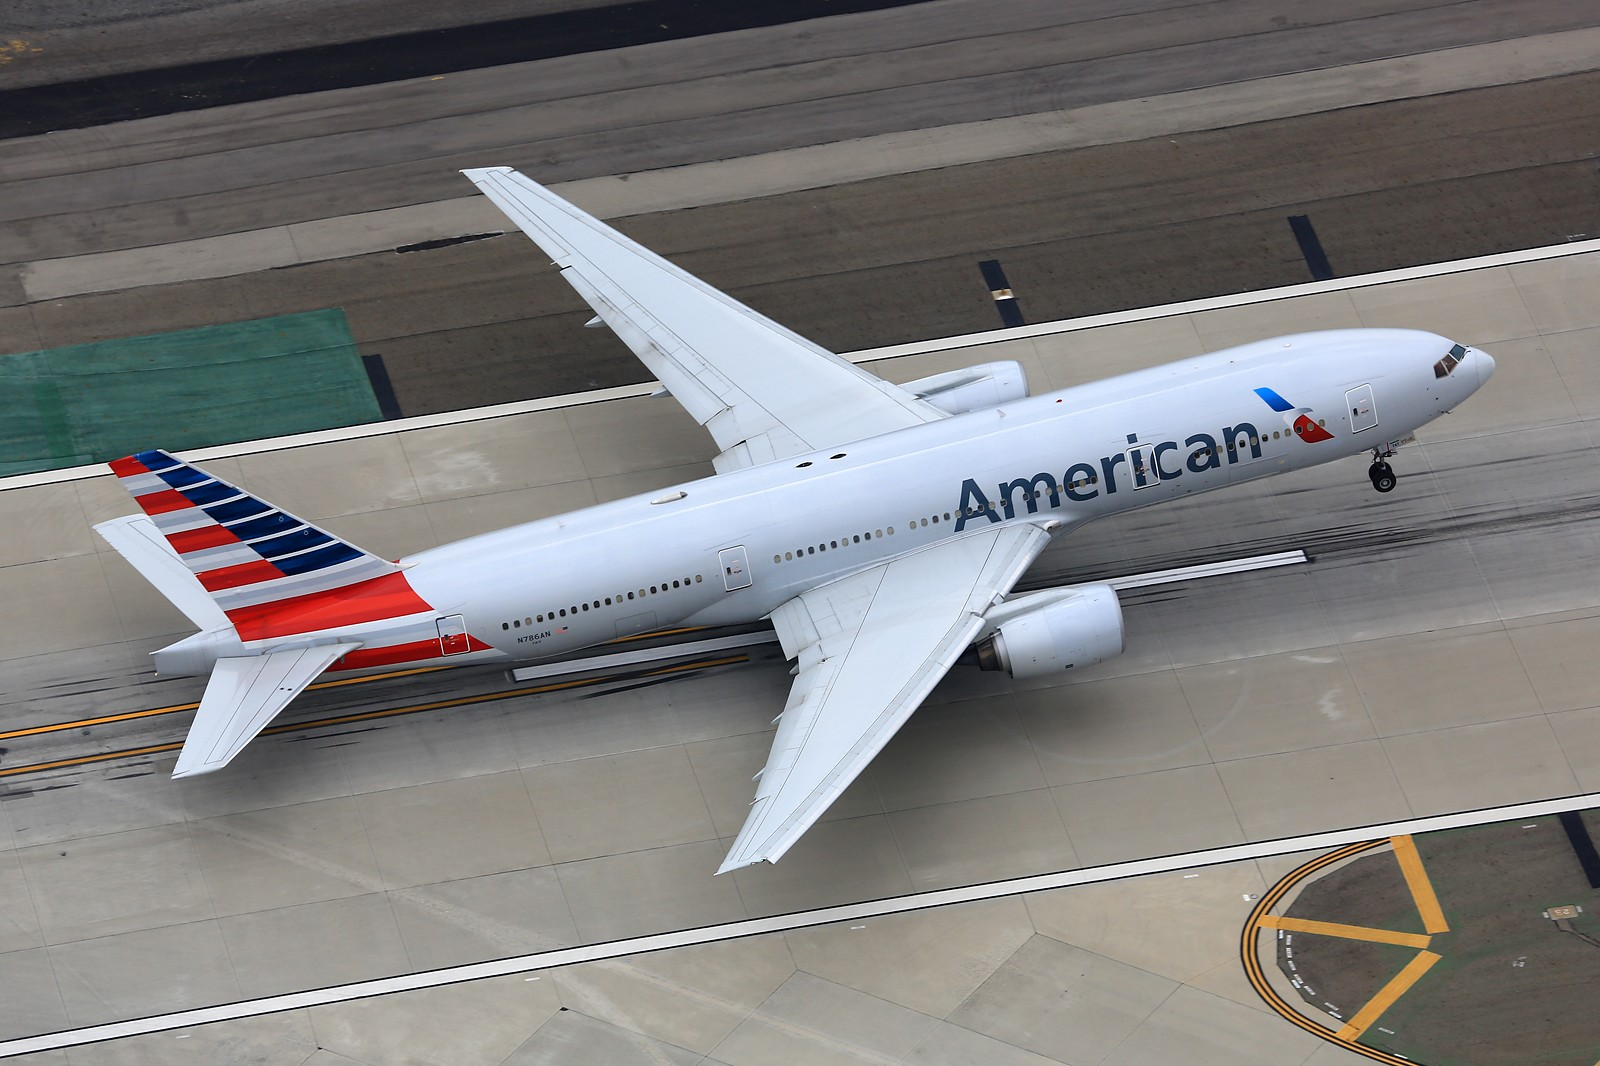 Re:[原创]【LAX】**********777级了,空对空&空对地部分777合集[1600*1067]********** BOEING 777-200ER N786AN 美国洛杉矶机场